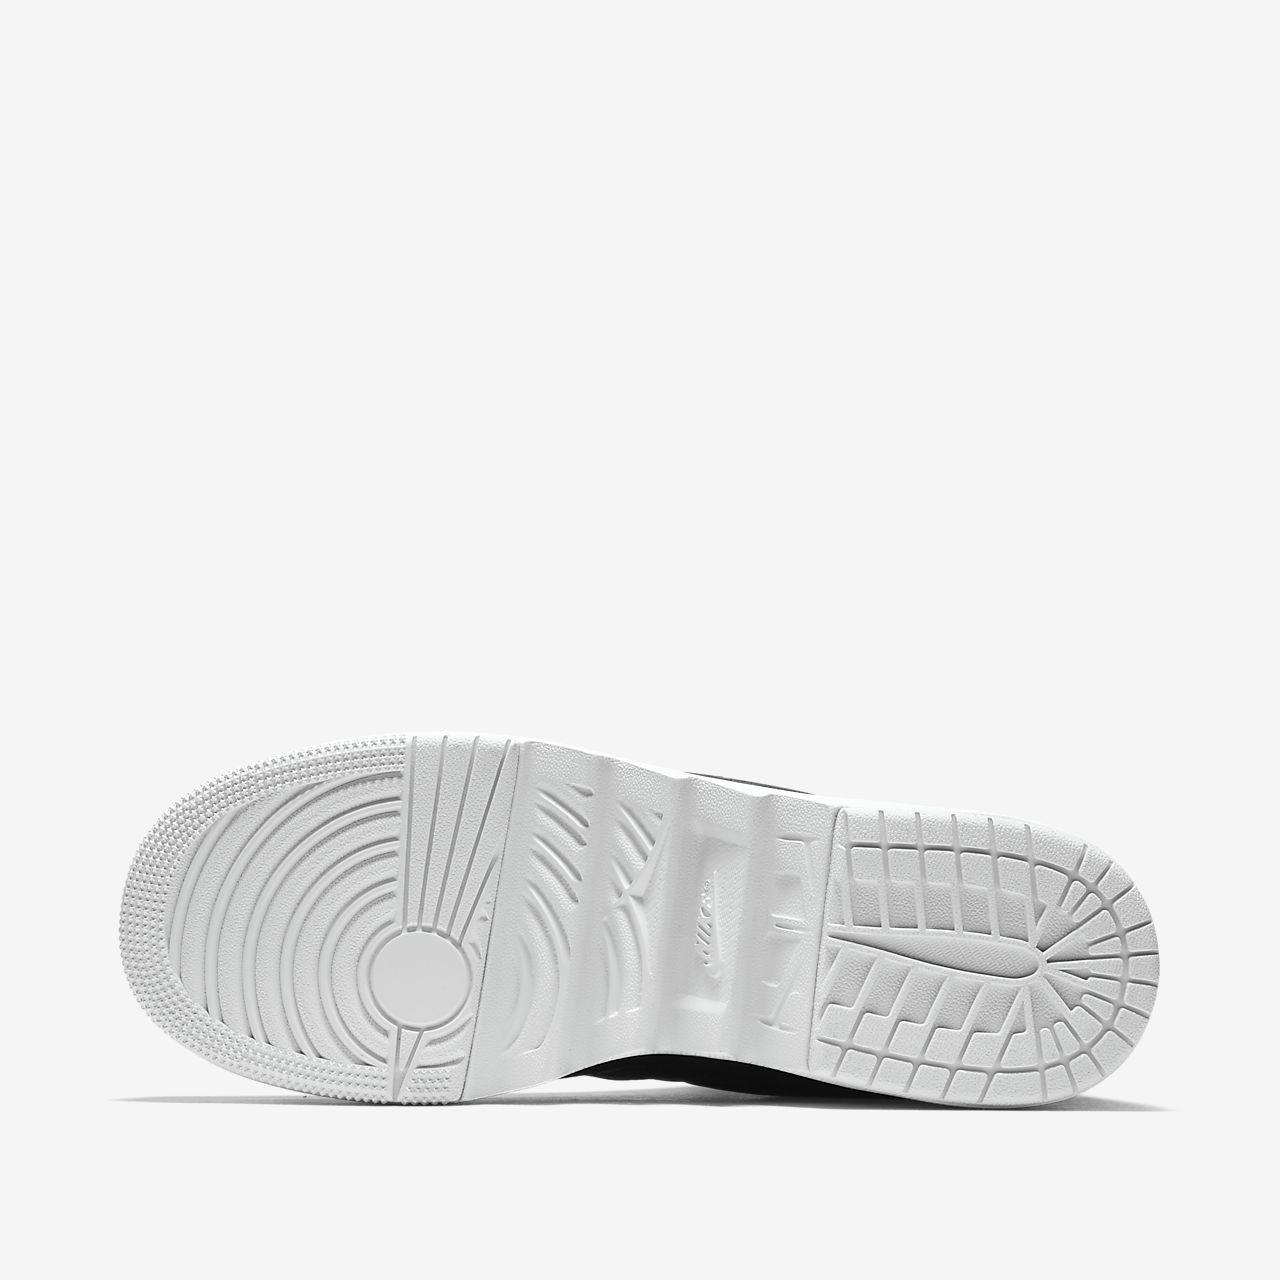 super popular cdcf2 892fb ... Air Jordan 1 Jester XX Women s Shoe